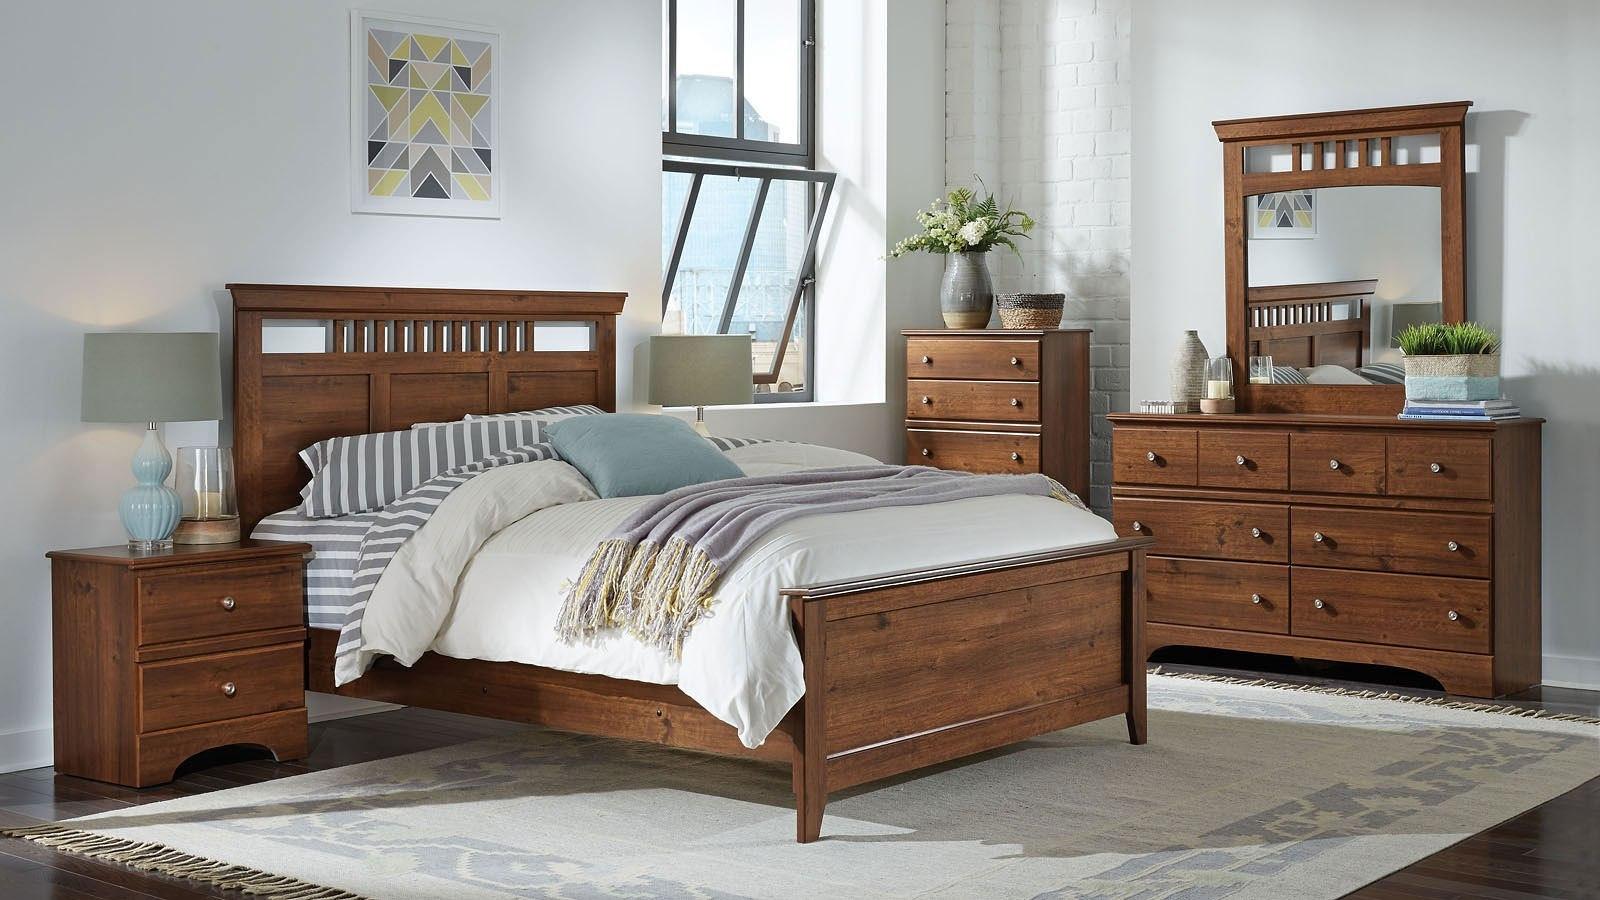 chatom panel bedroom set standard furniture furniture cart. Black Bedroom Furniture Sets. Home Design Ideas